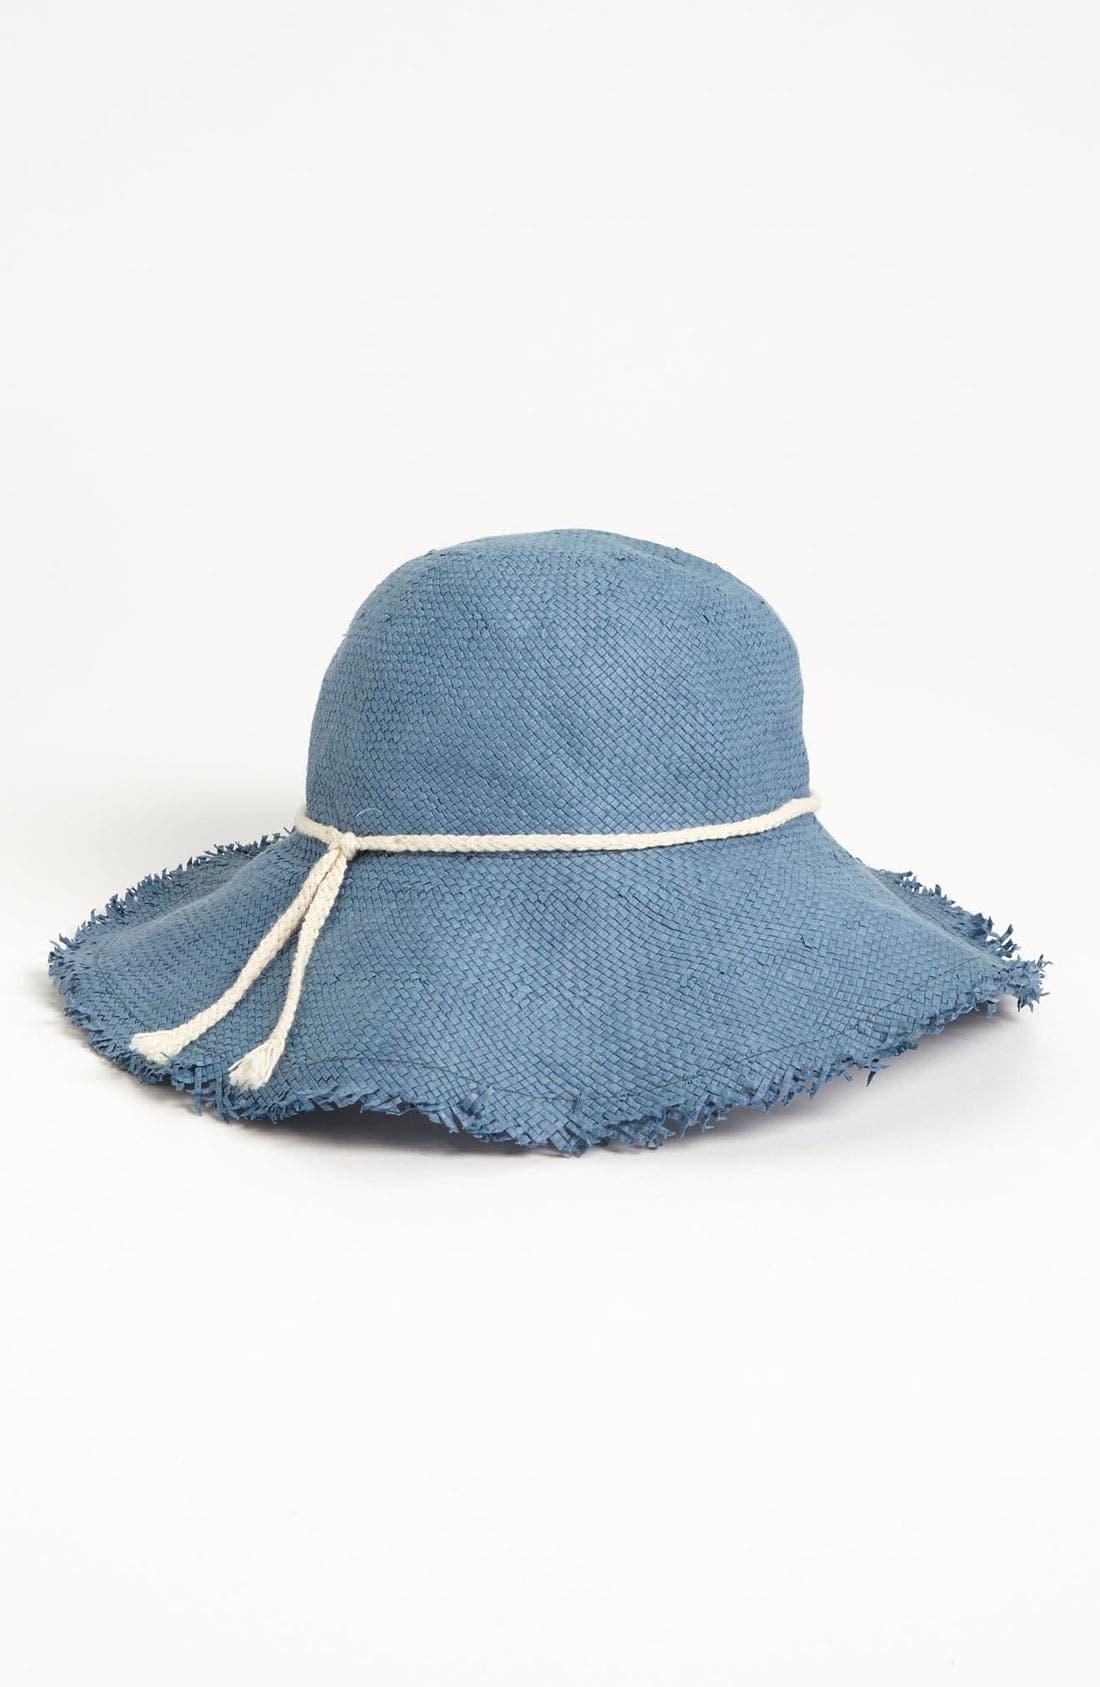 Alternate Image 1 Selected - San Diego Hat Floppy Hat (Girls)